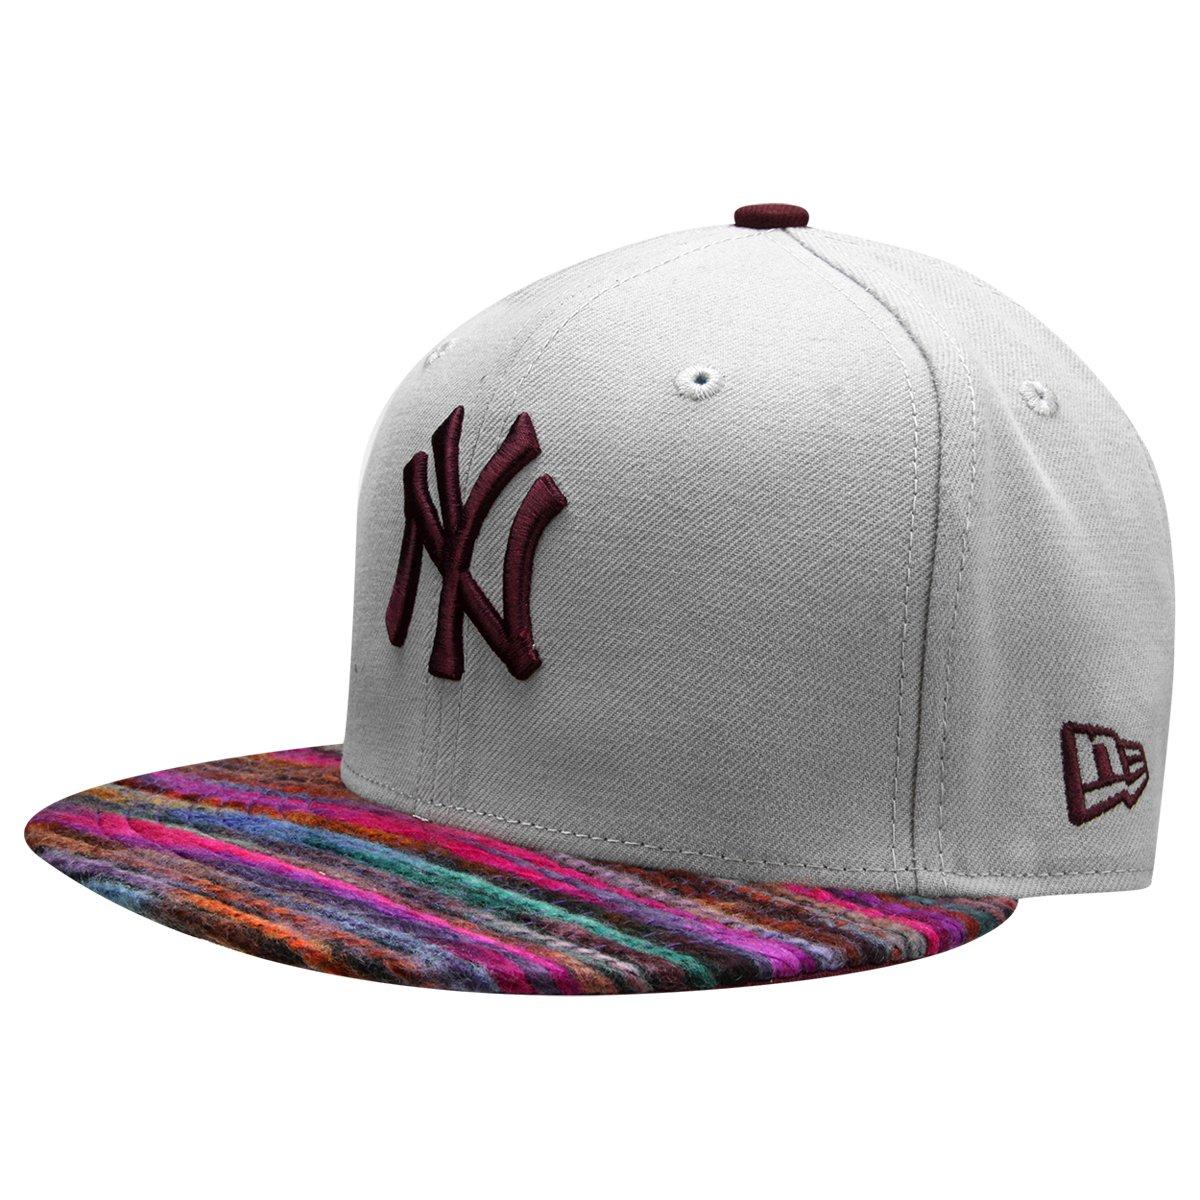 Boné New Era 950 MLB AF Heather Los Angeles Dodgers - Compre Agora ... c695085aaa6